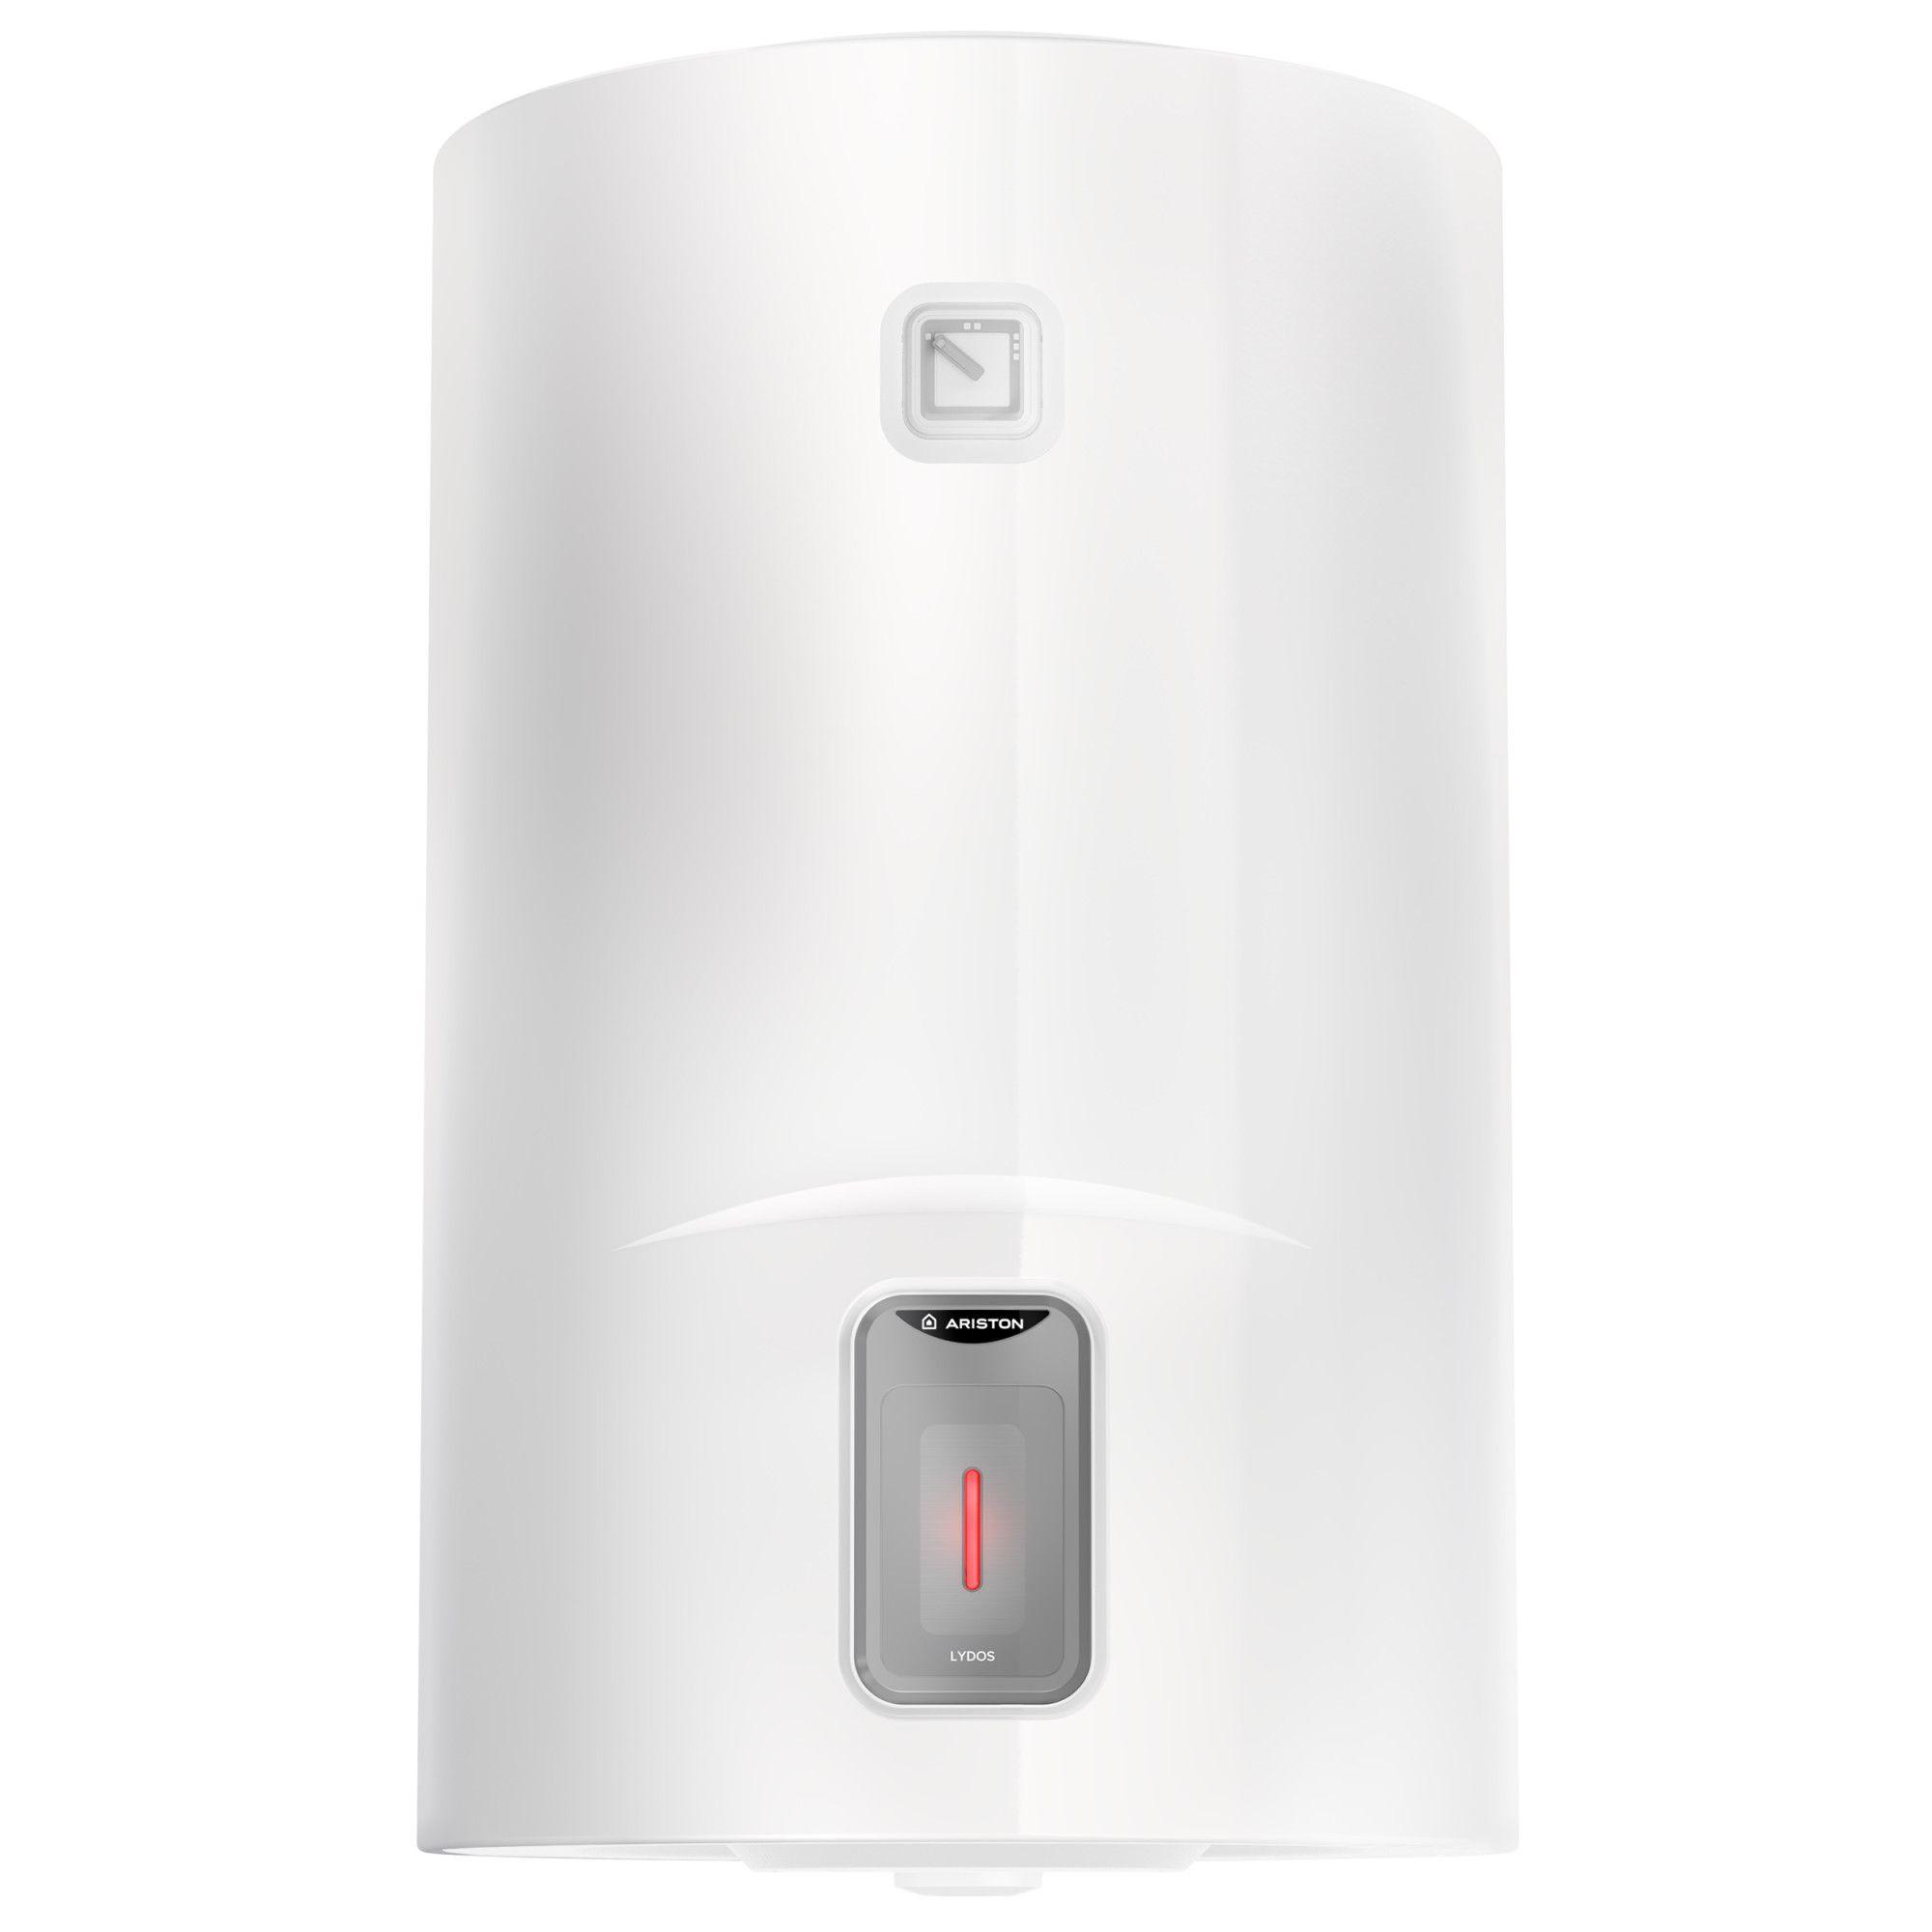 Boiler electric Ariston Lydos R 50L, 1800W, rezervor emailat cu Titan